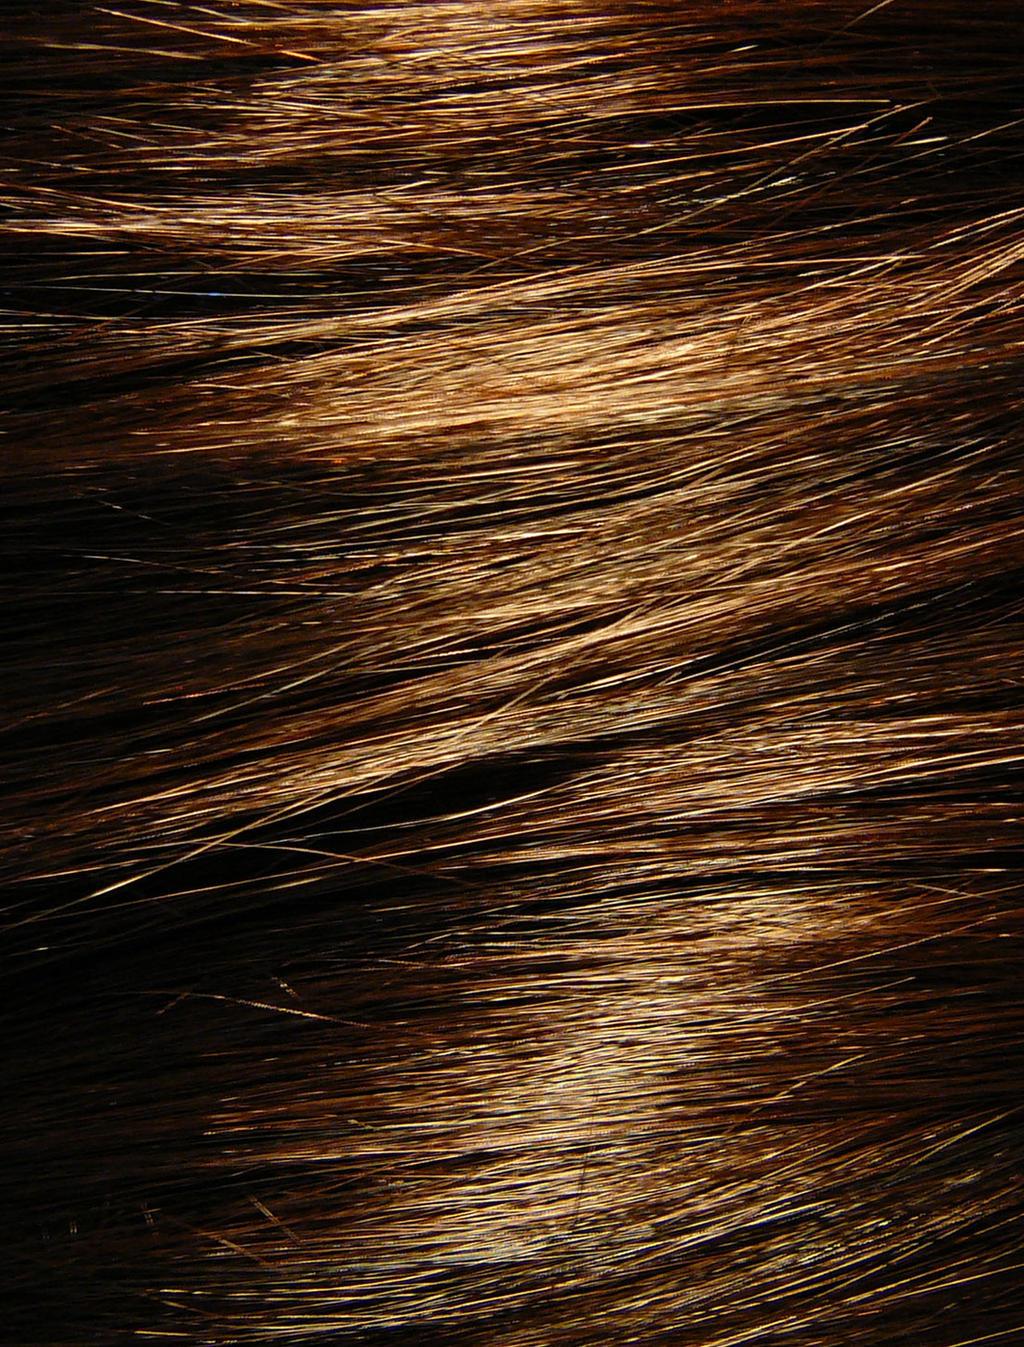 Brown Hair Texture Stock